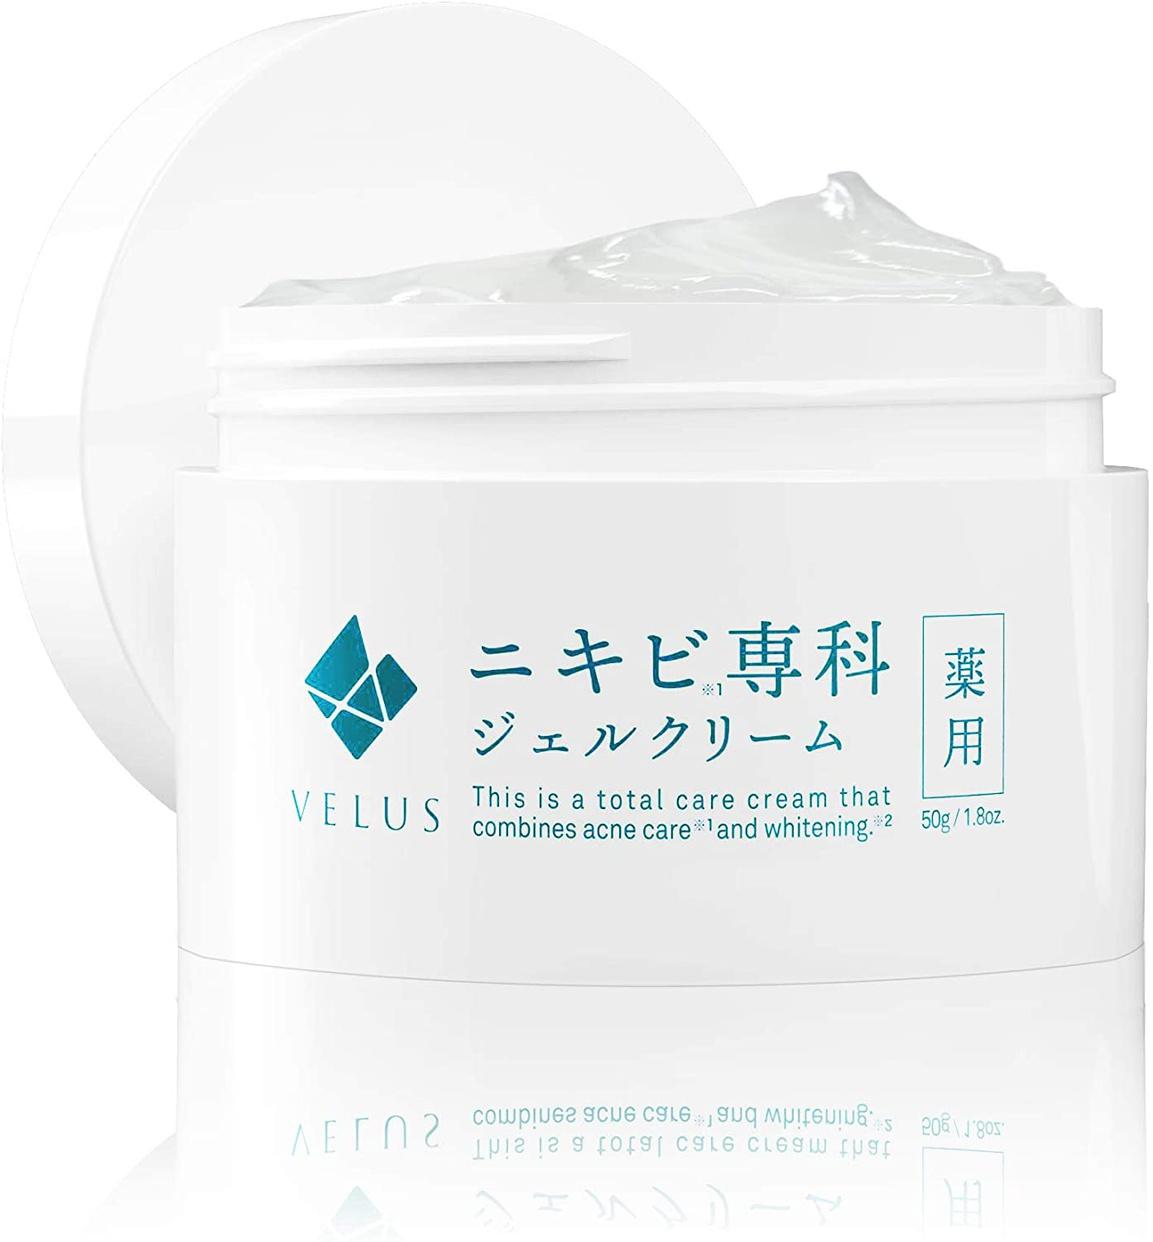 VELUS(ベルス) ニキビ専科【薬用】ジェルクリームの商品画像